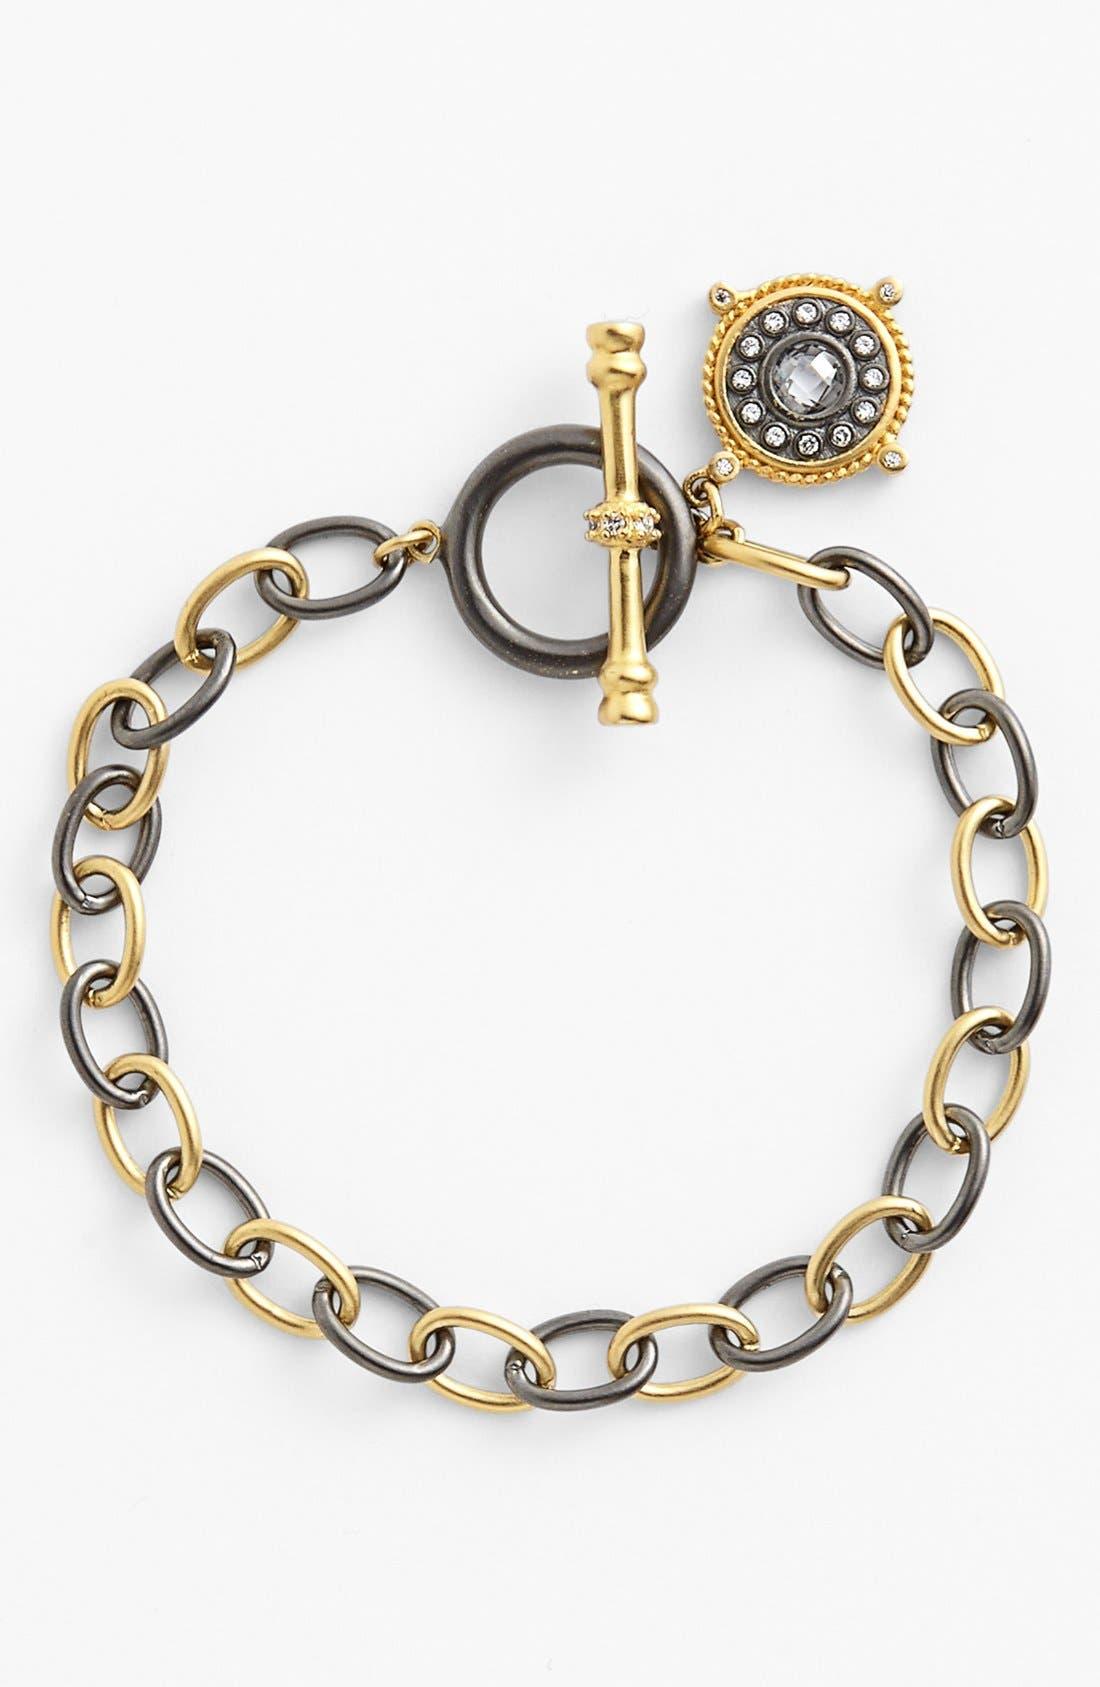 Alternate Image 1 Selected - FREIDA ROTHMAN 'Hamptons' Nautical Compass Charm Toggle Bracelet